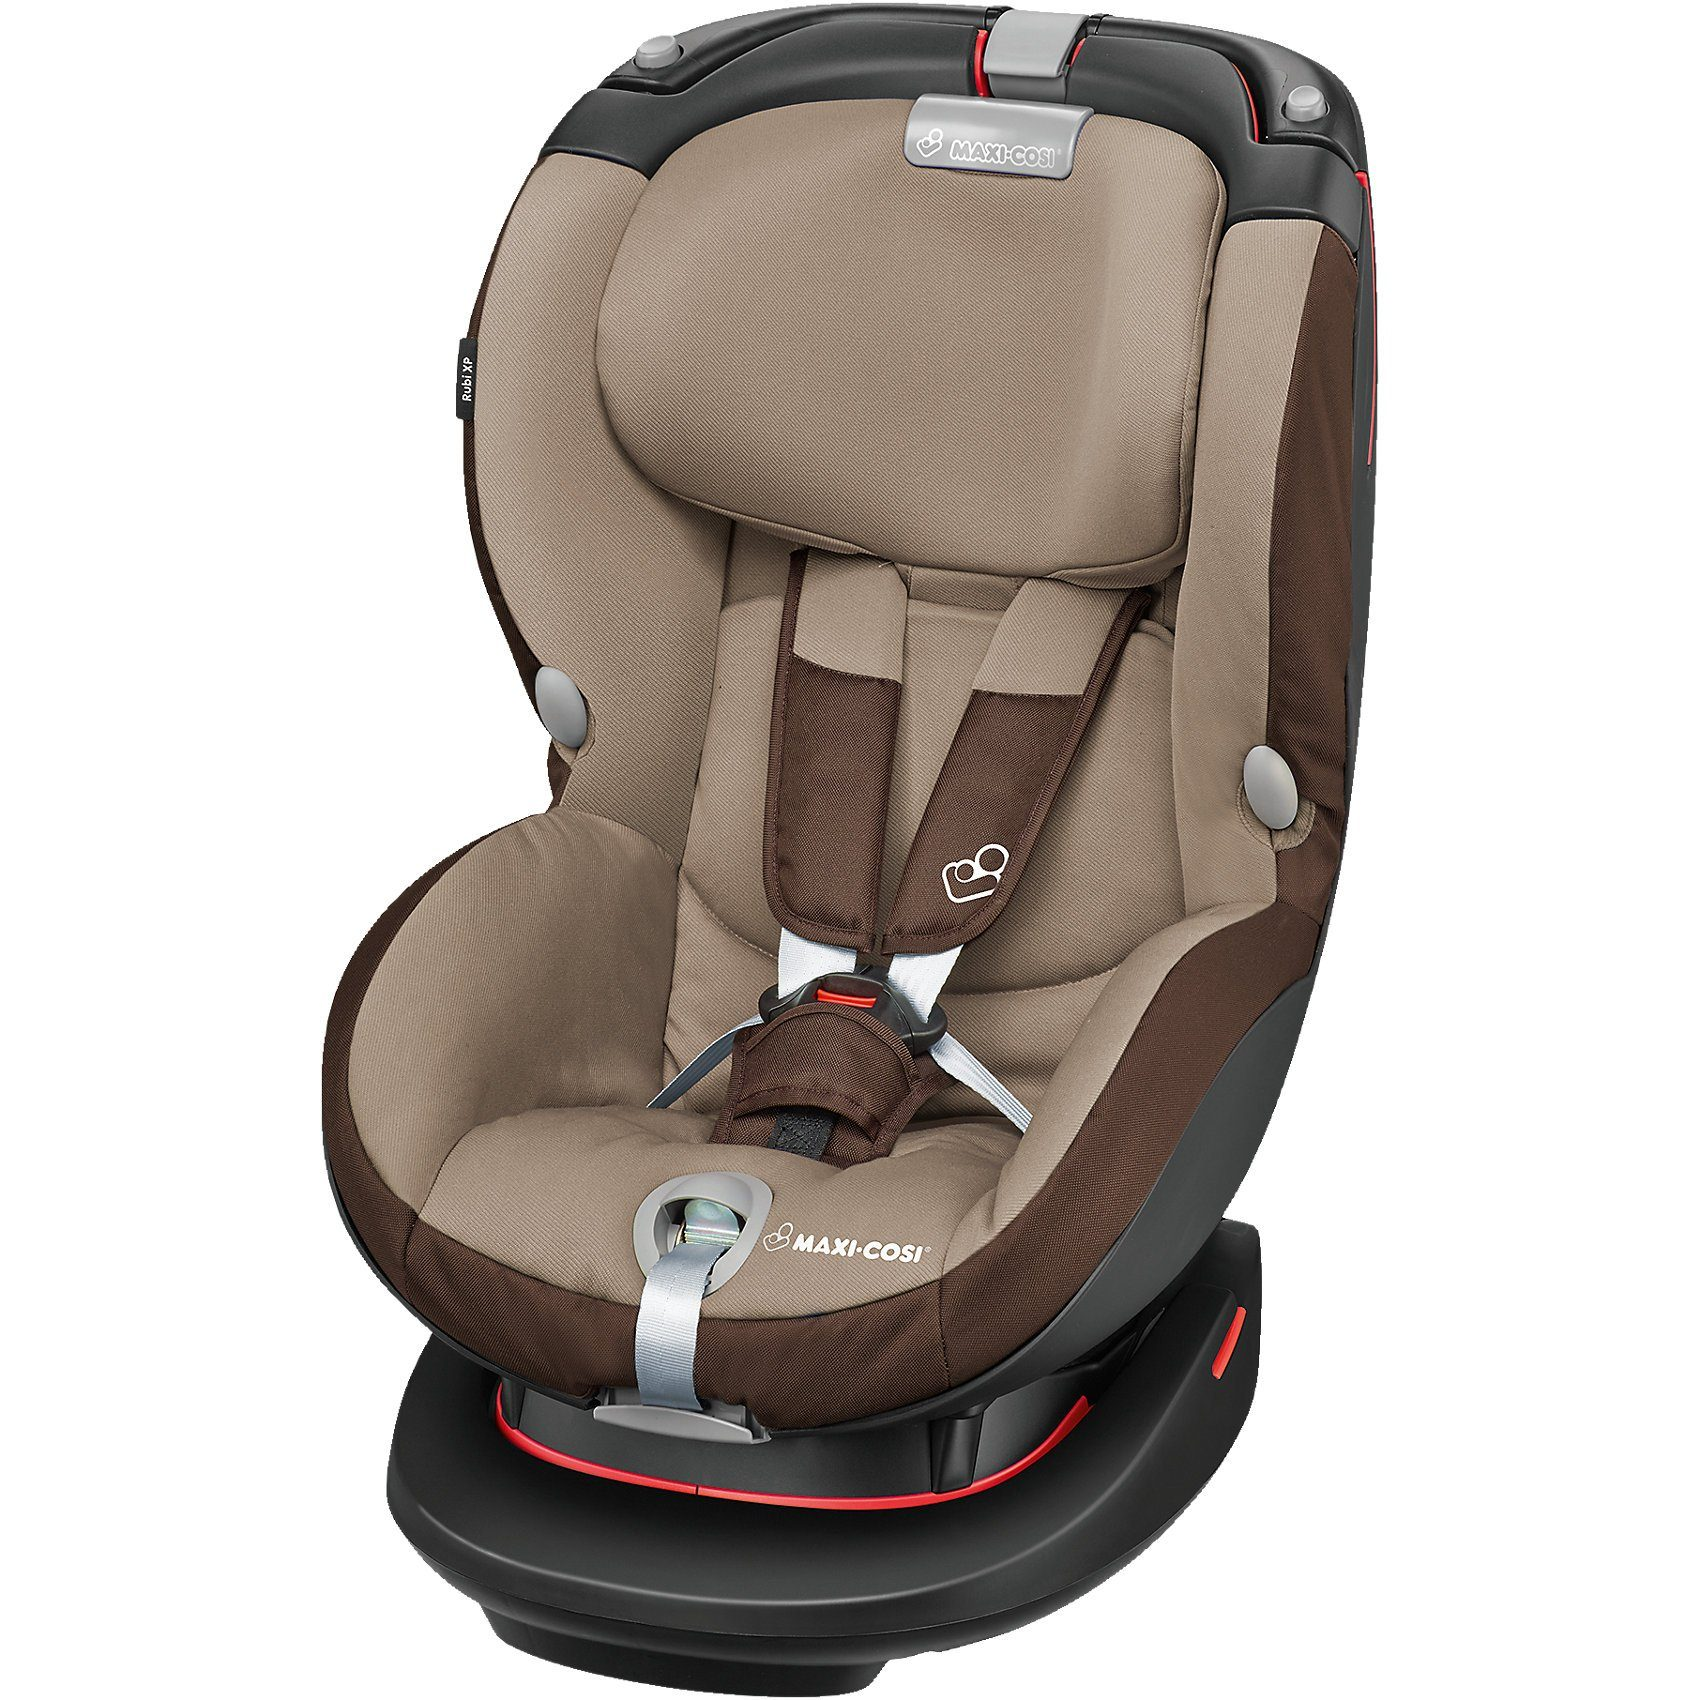 Maxi-Cosi Auto-Kindersitz Rubi XP, Hazelnut Brown, 2018